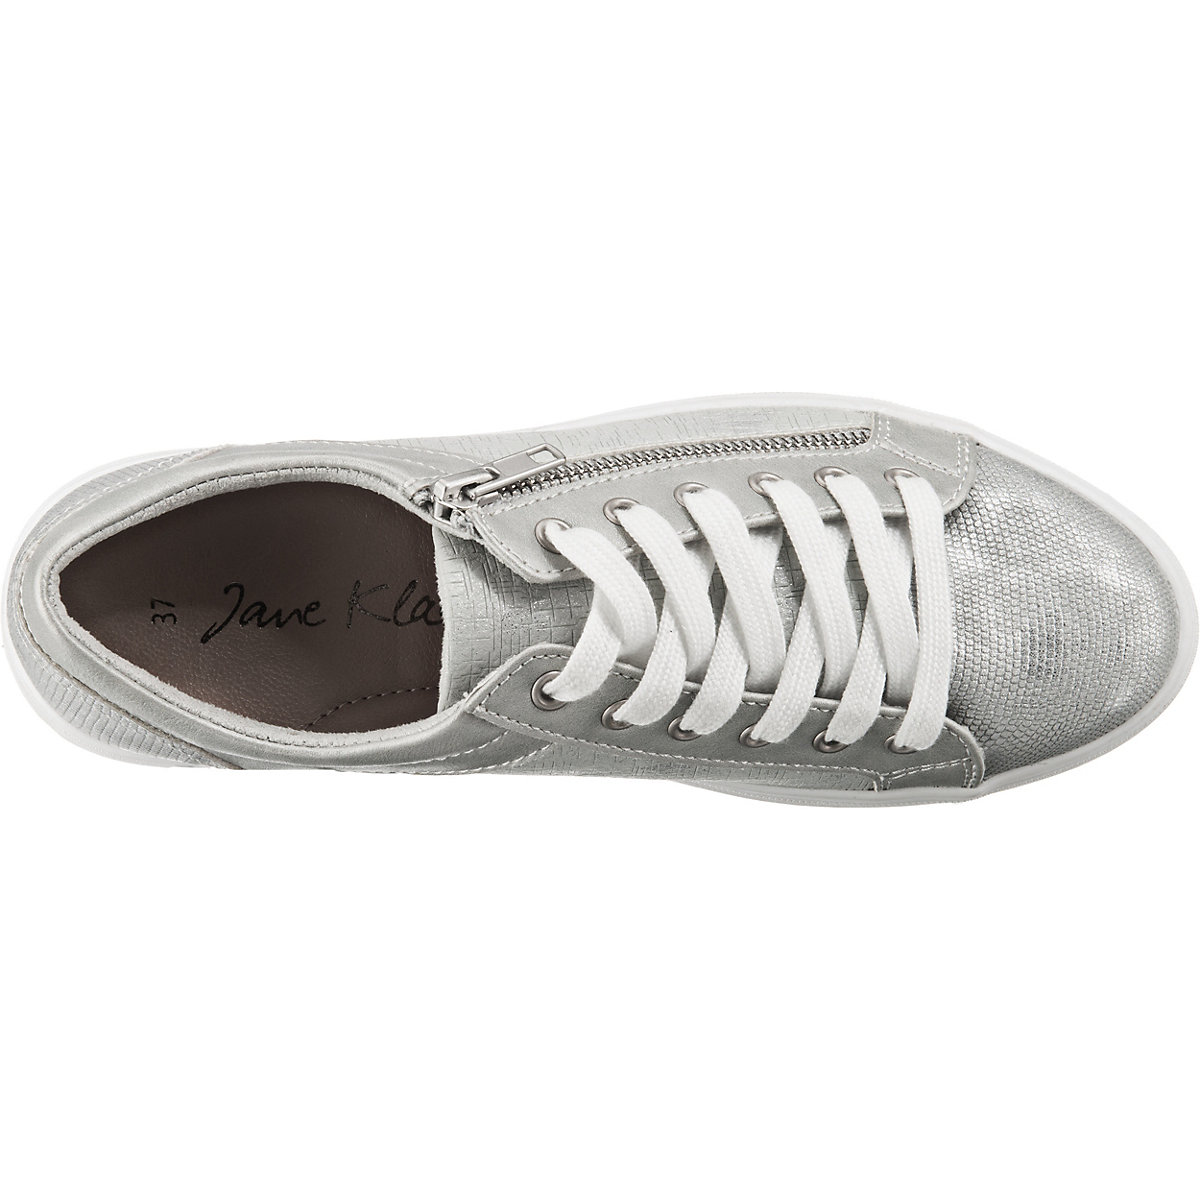 Jane Klain, Sneakers Low, Silber